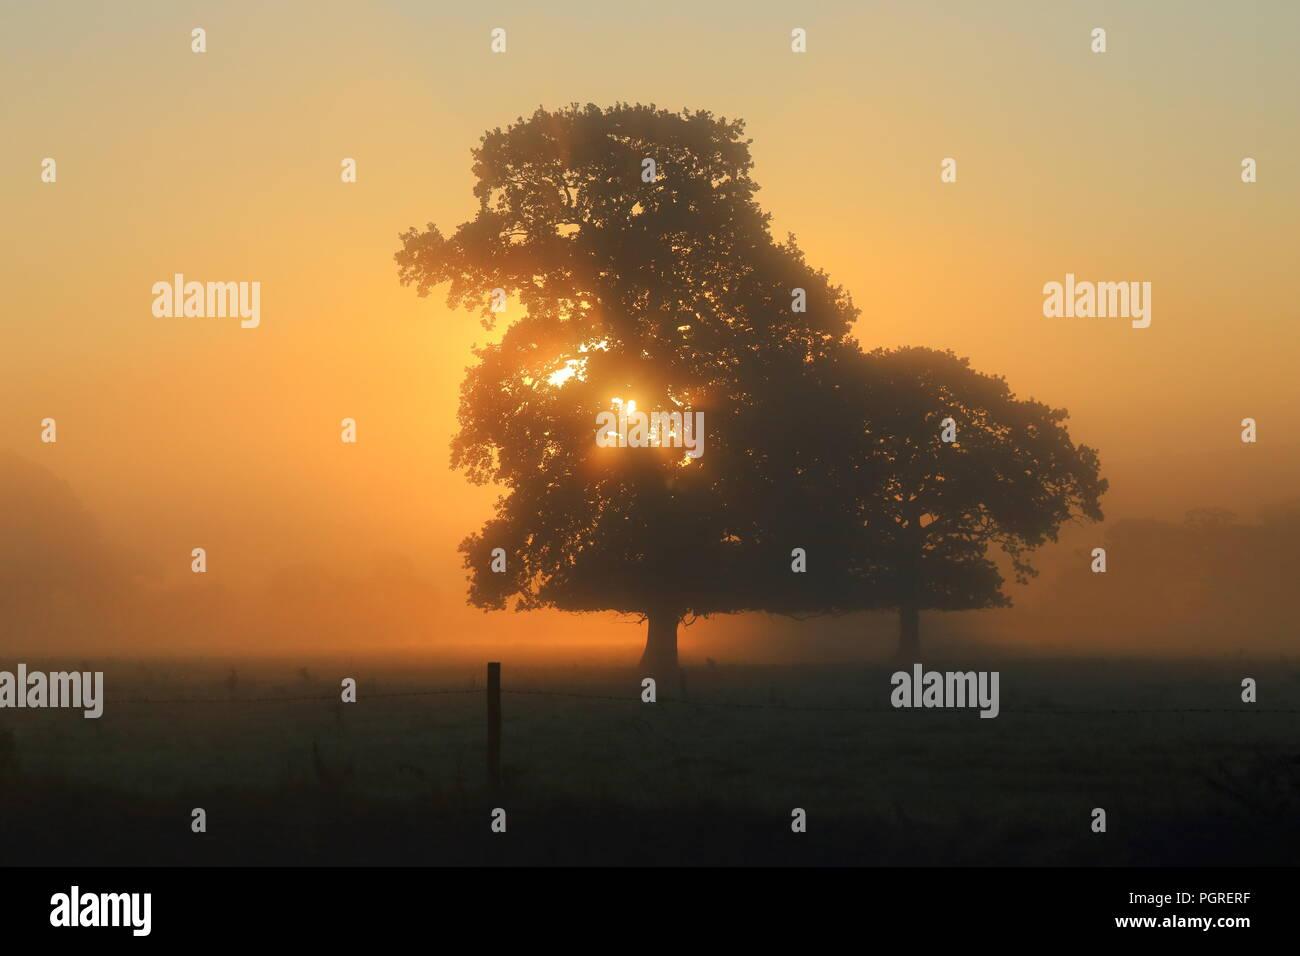 Sun rays shining through tree on the misty morning - Stock Image